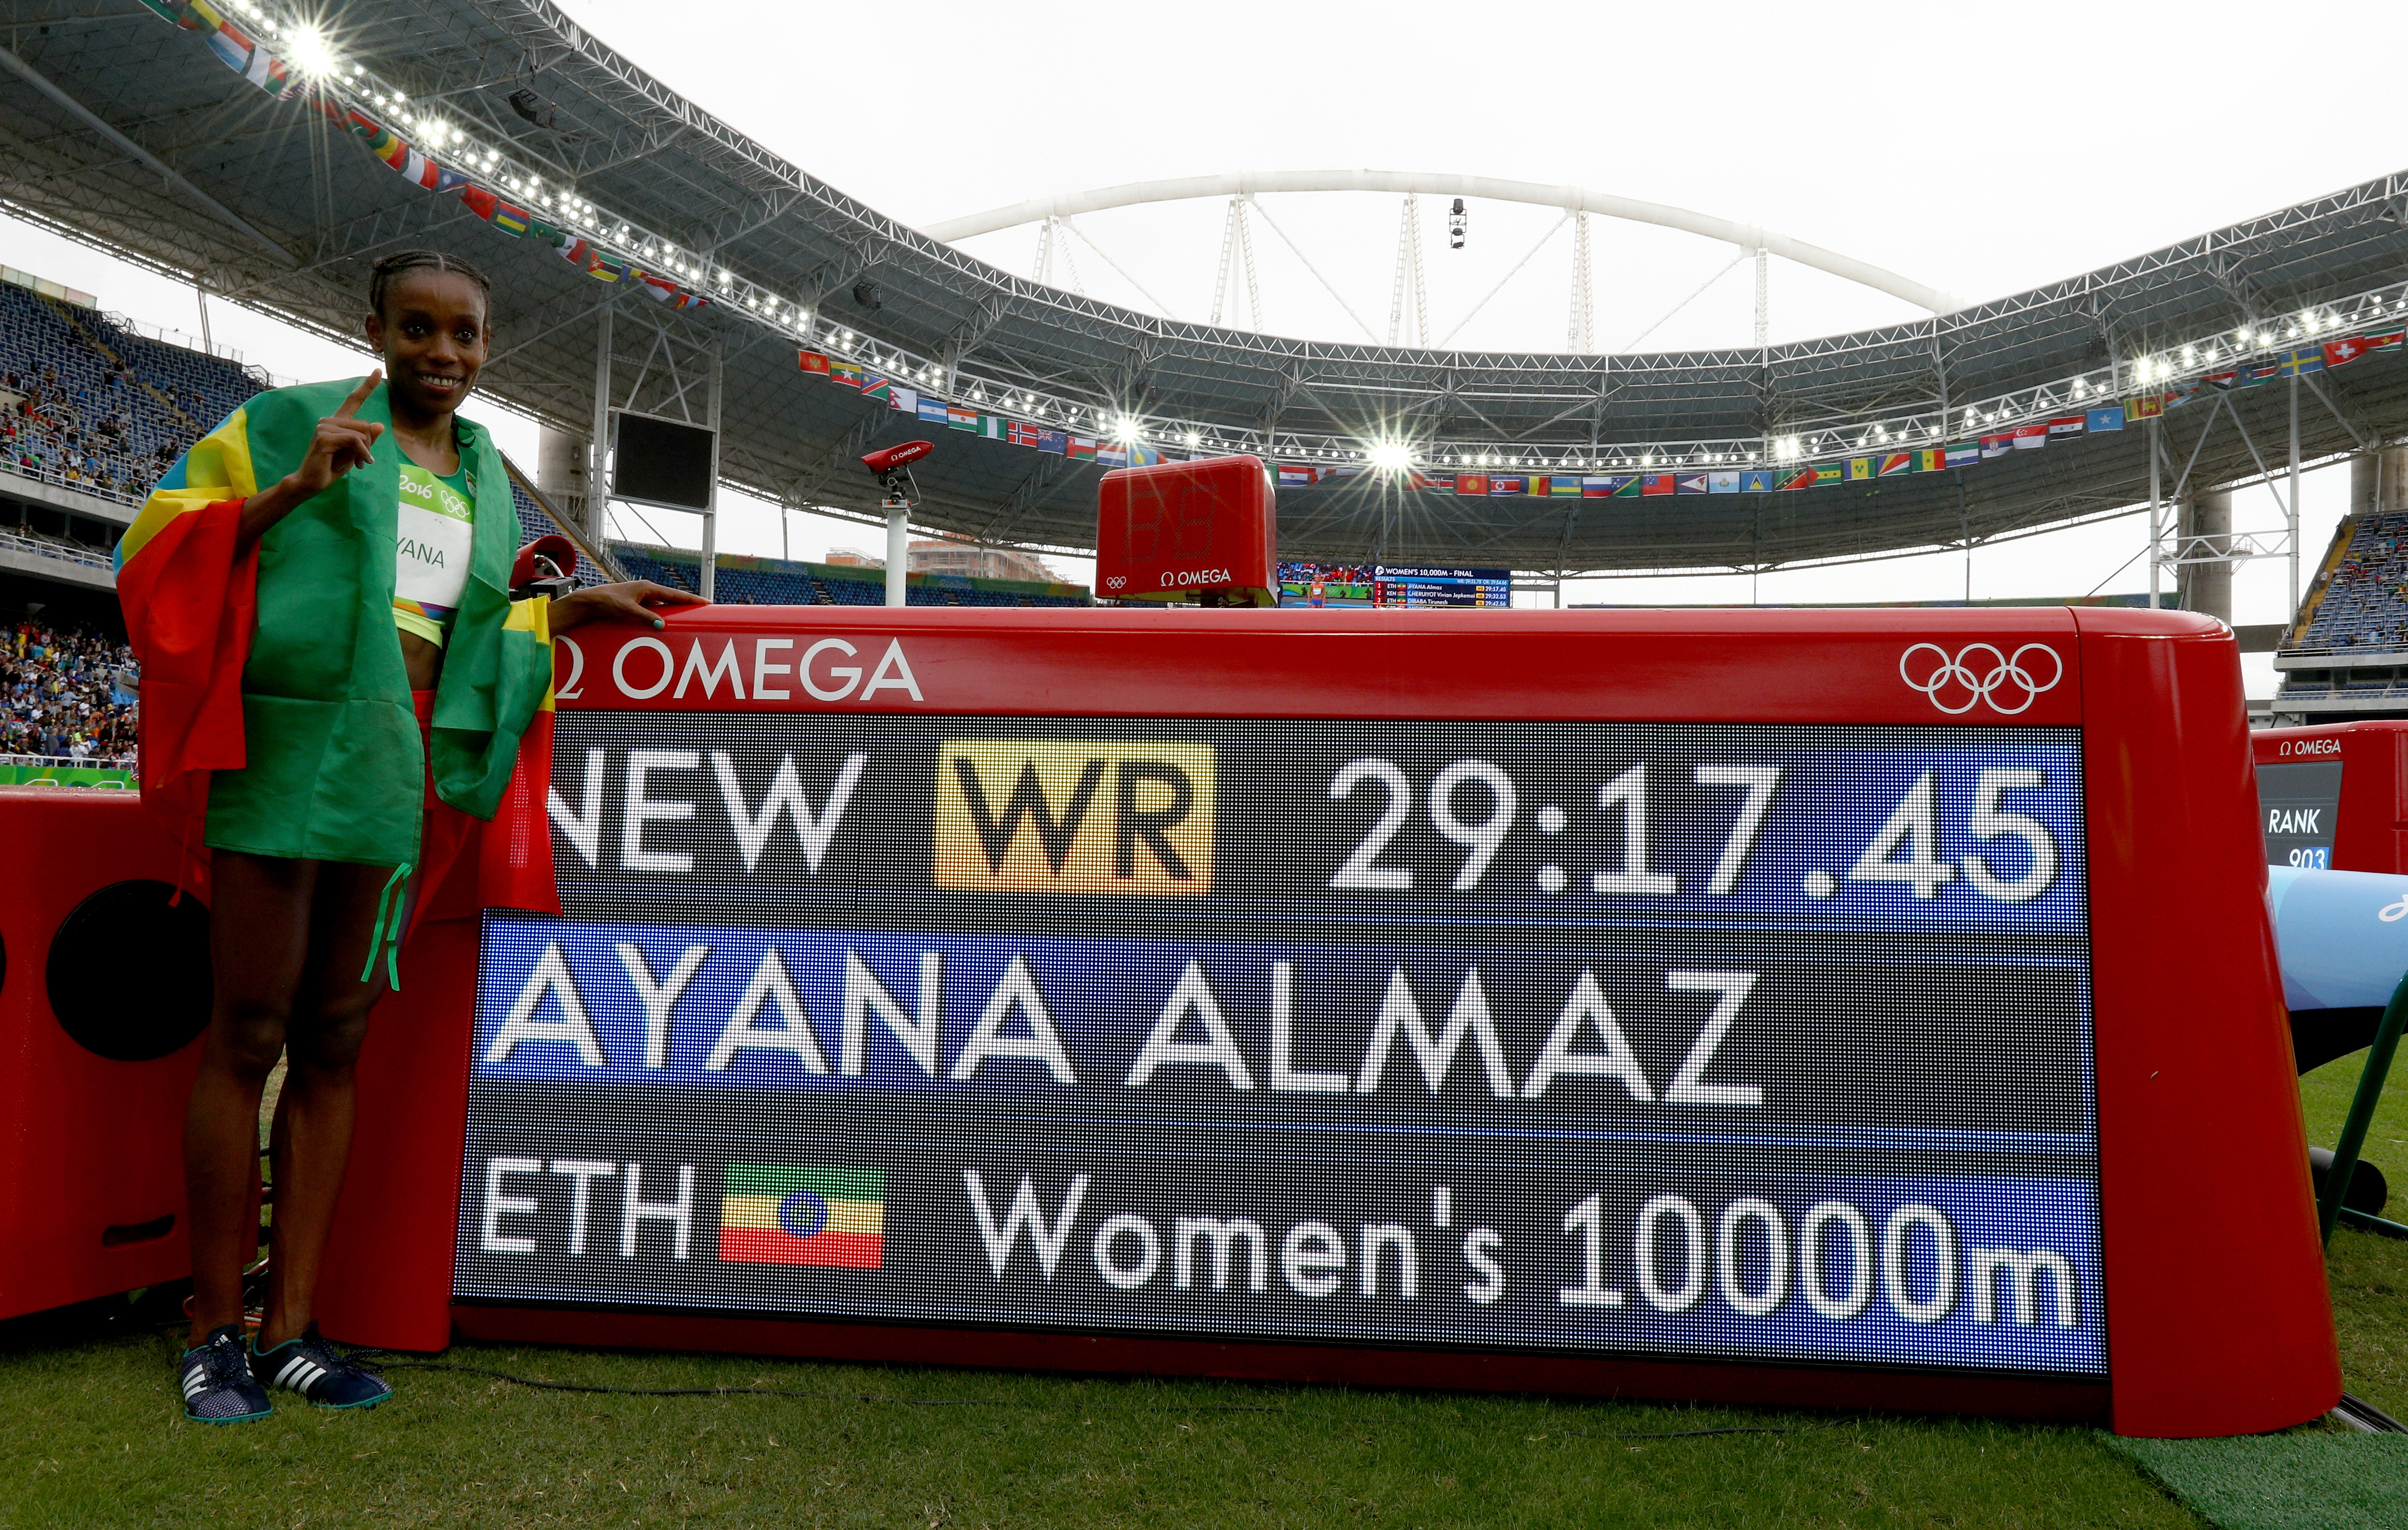 олимпийские медали картинки